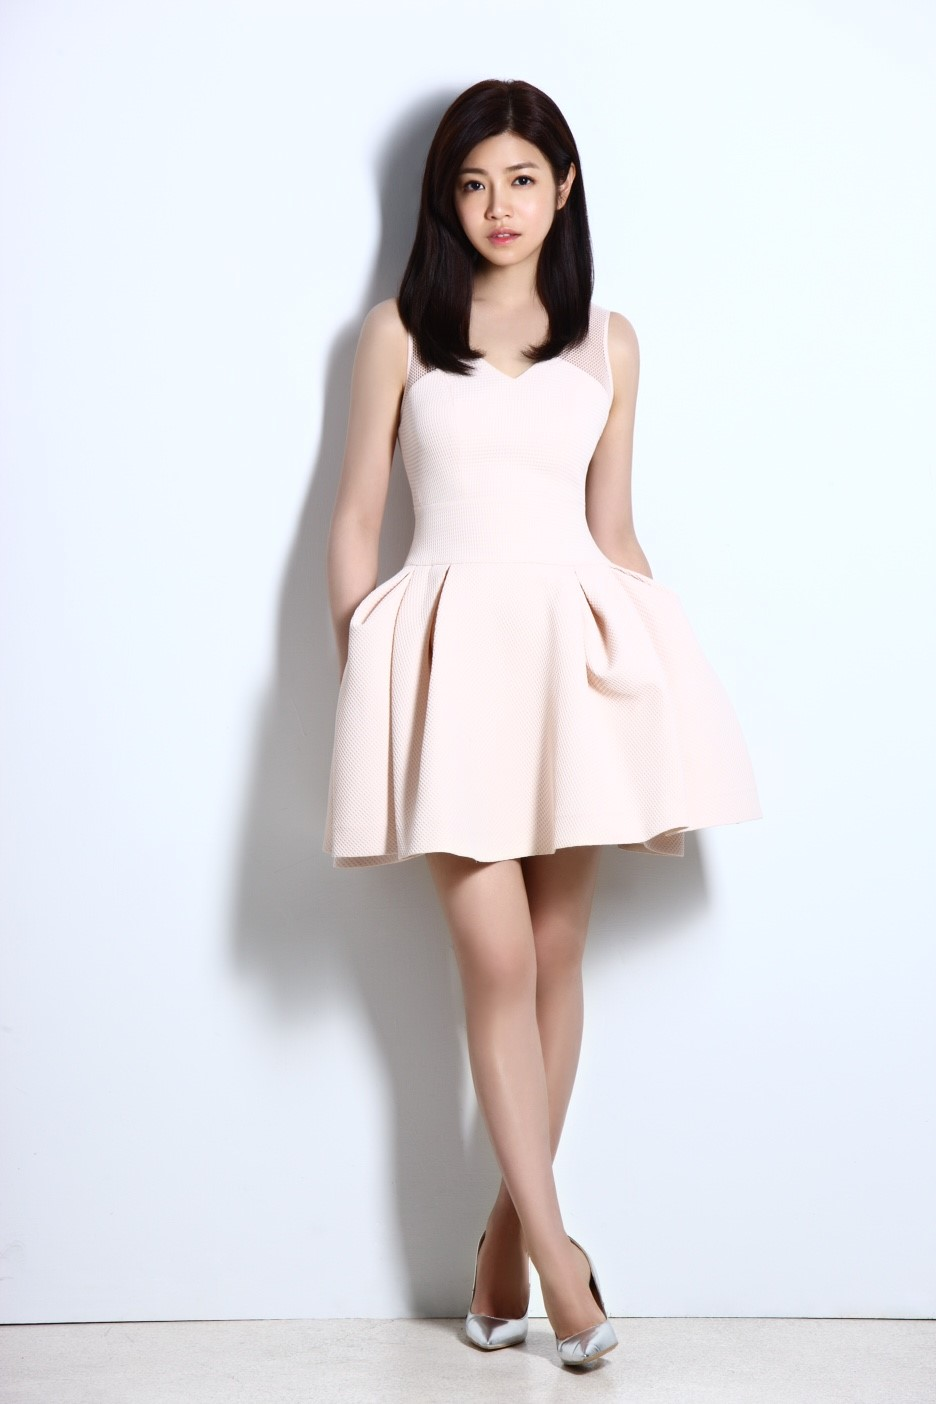 陈妍希 Michelle Chen